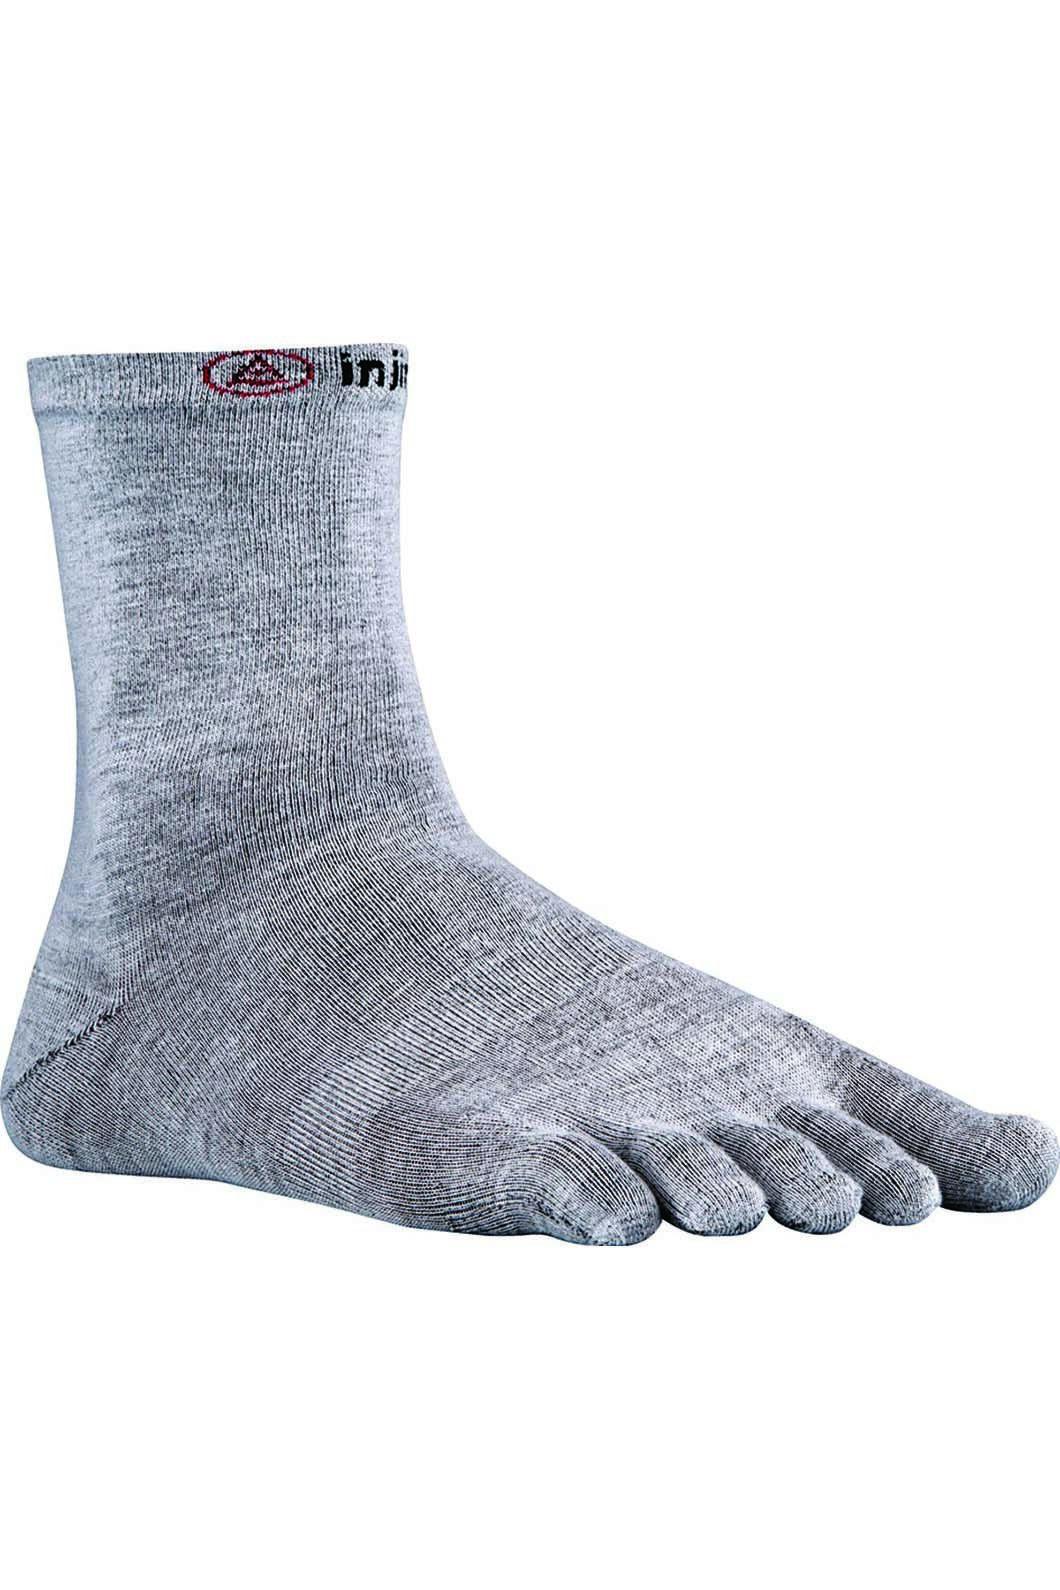 Injinji Unisex CoolMax Sock Liner, Grey, hi-res